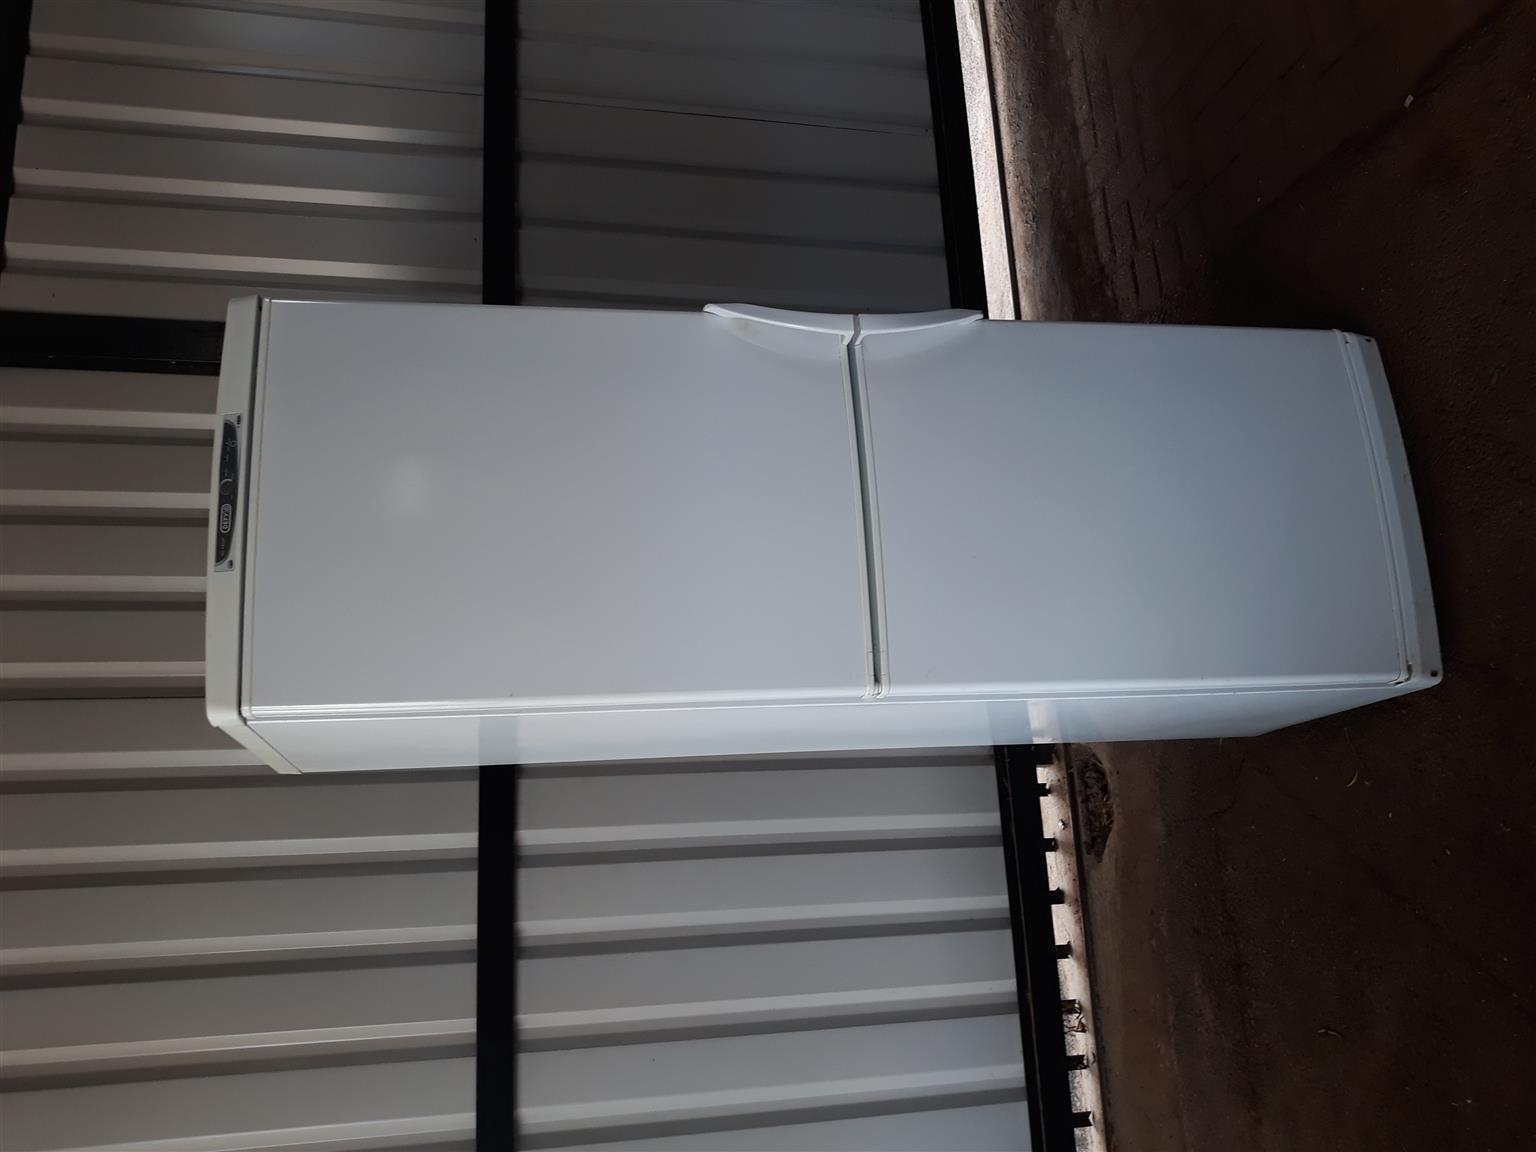 Defy Upright Freezer